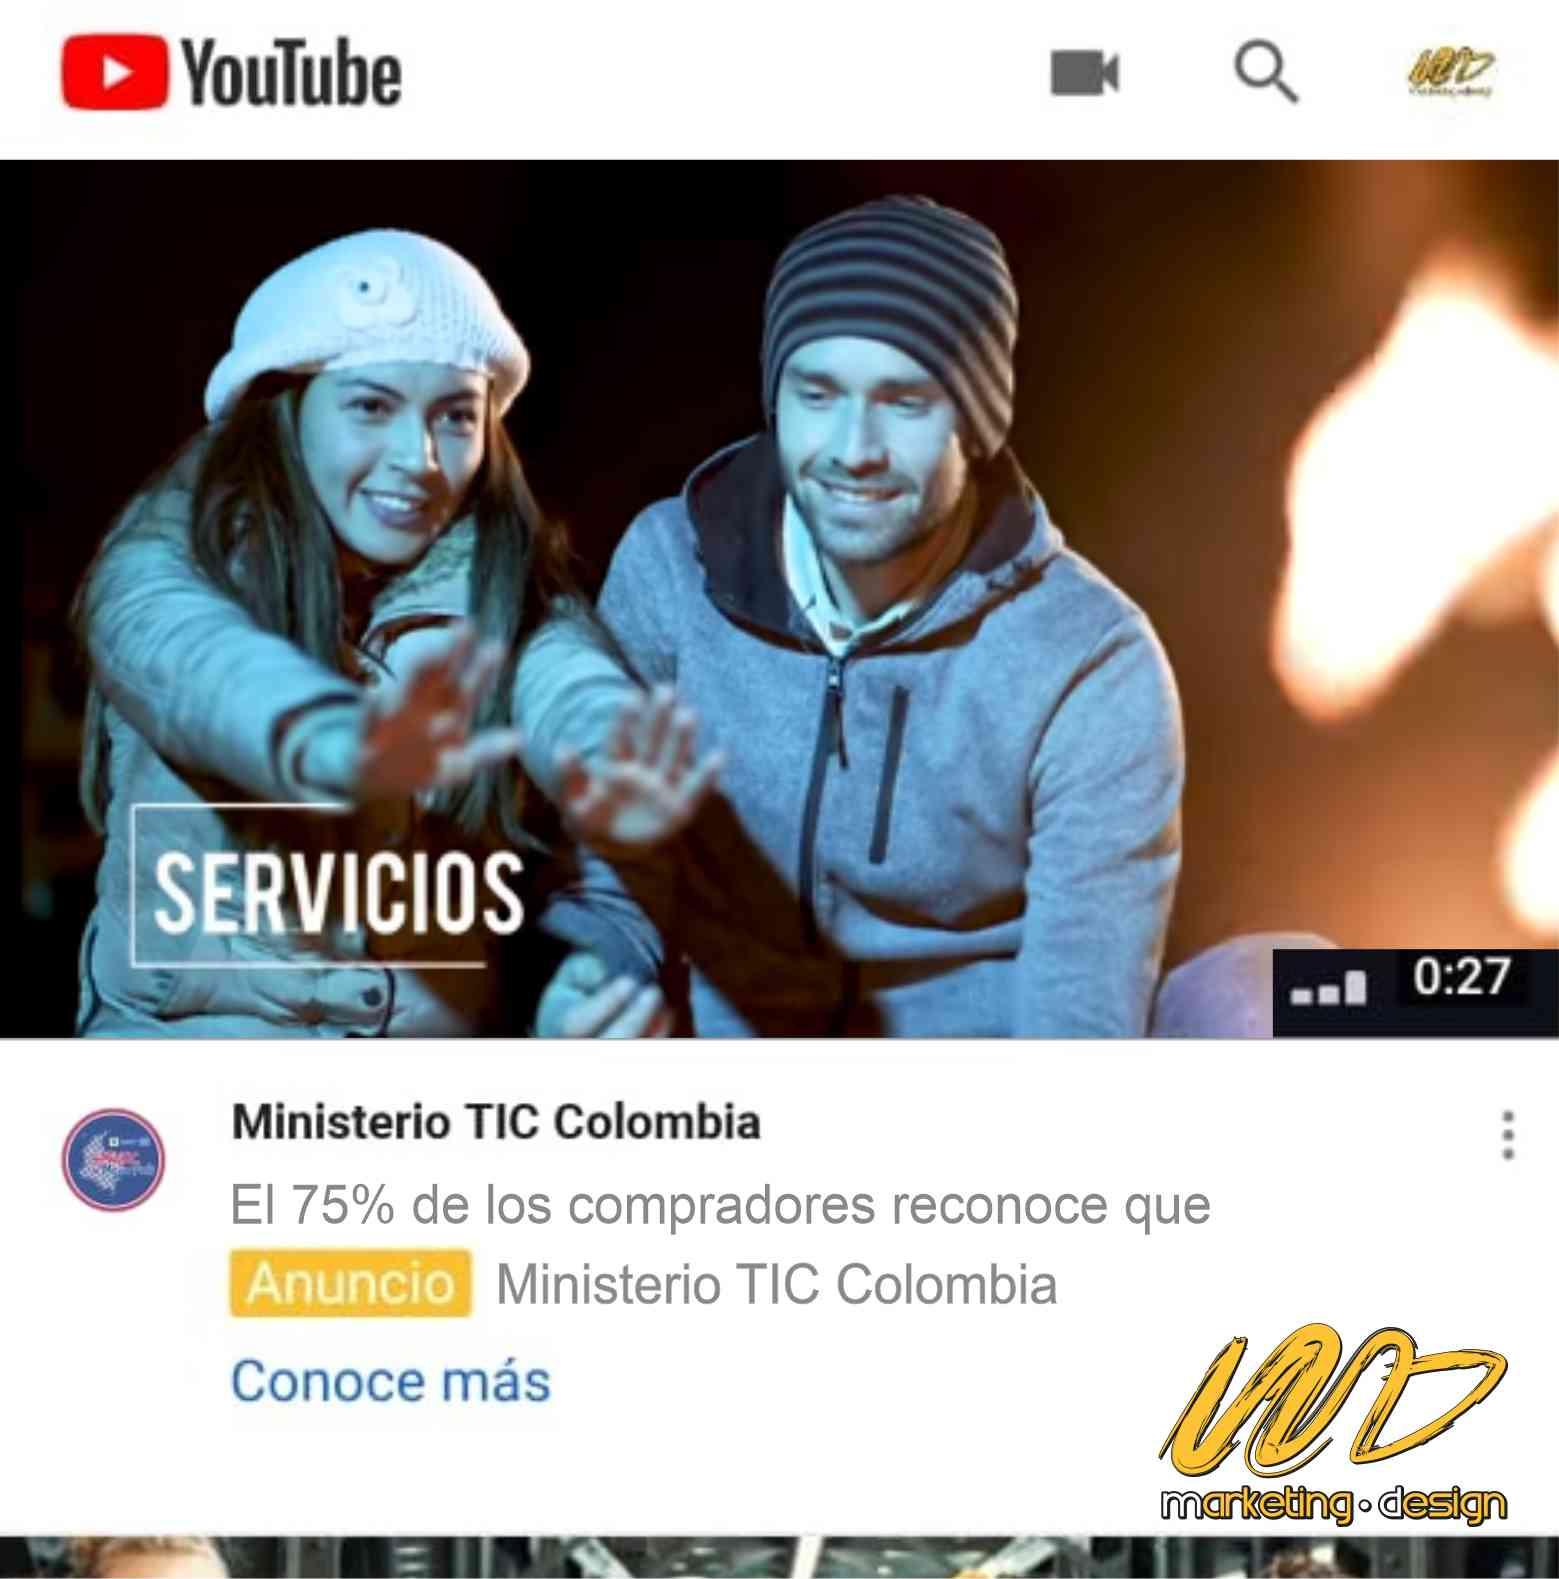 Clientes Pauta YouTube Marketing Design 1901